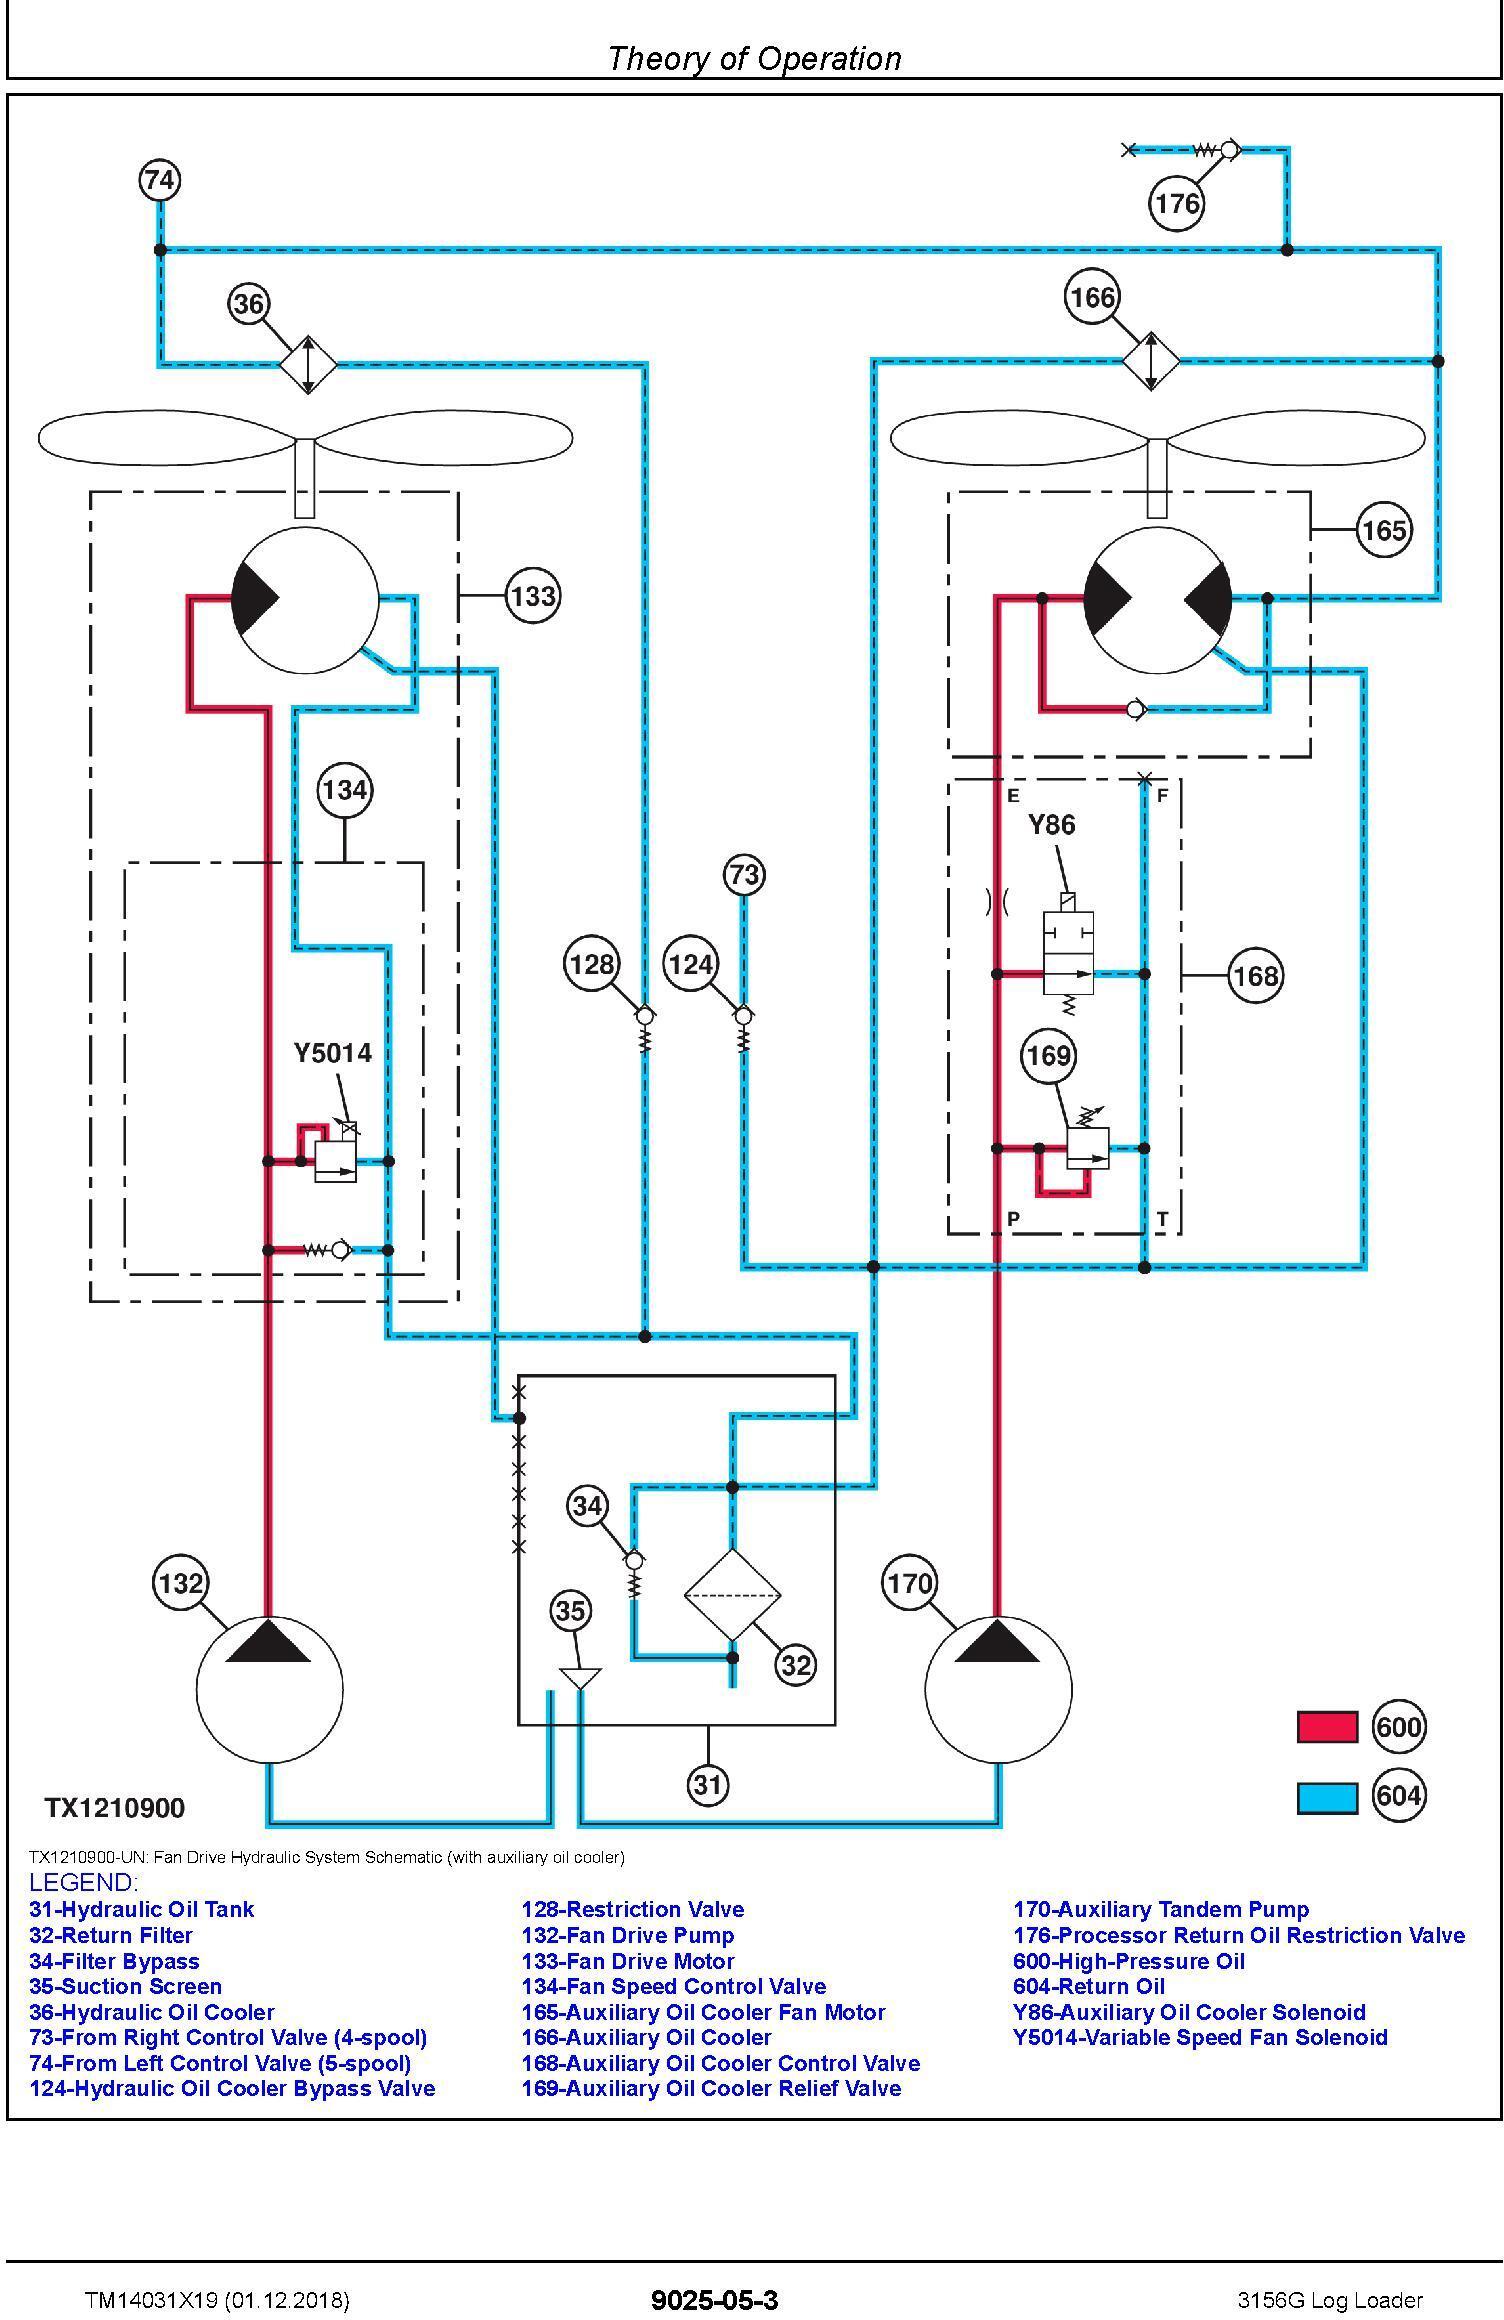 John Deere 3156G (SN. D316001-) Log Loader Operation & Test Technical Service Manual (TM14031X19) - 2